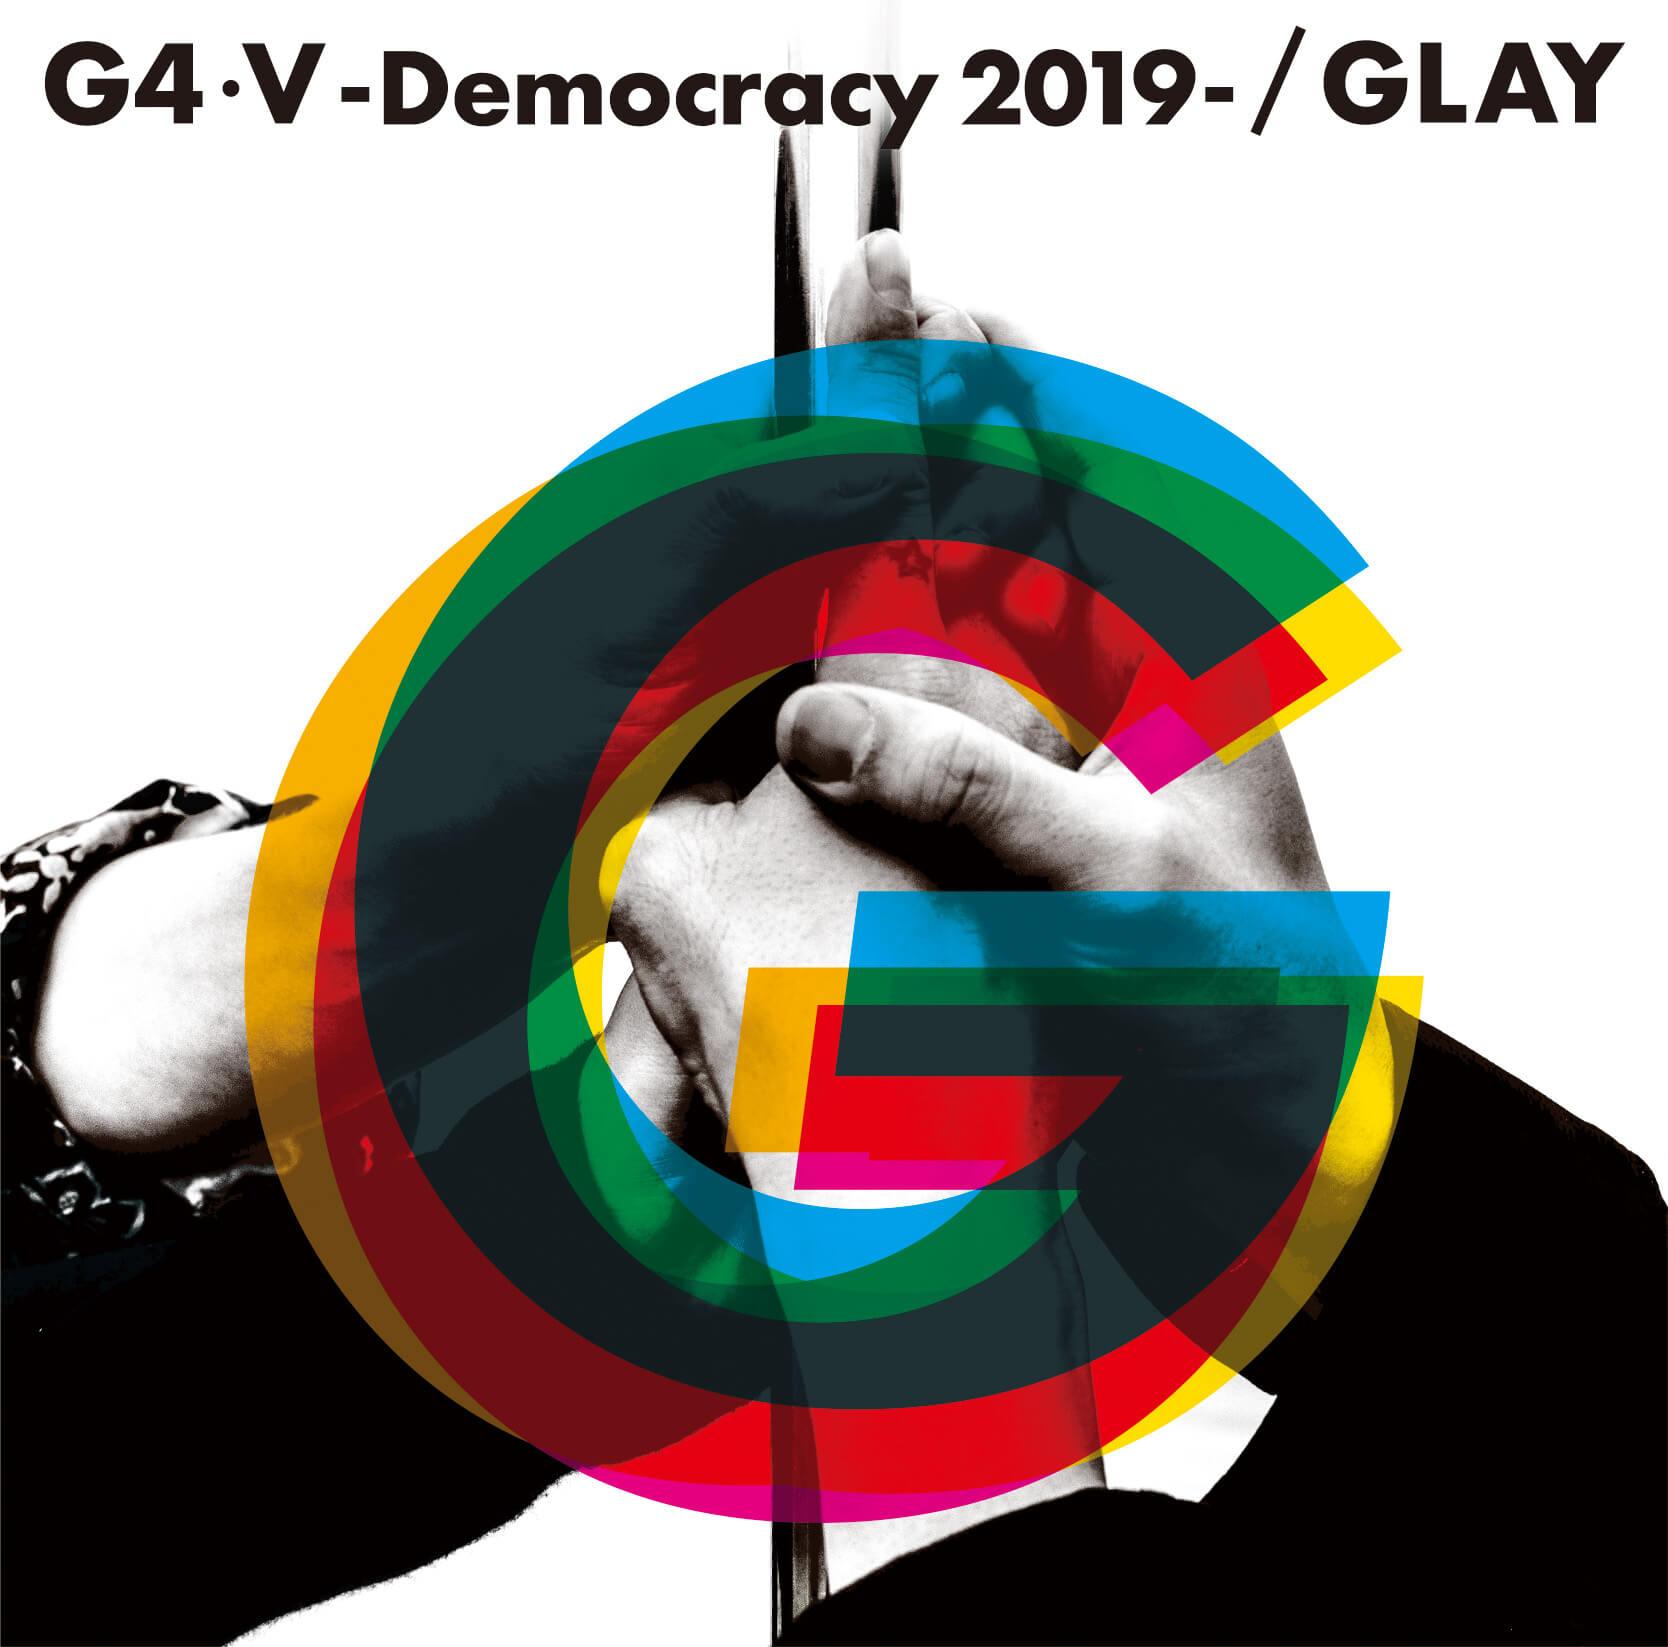 glay_h1_rgb_fix-2